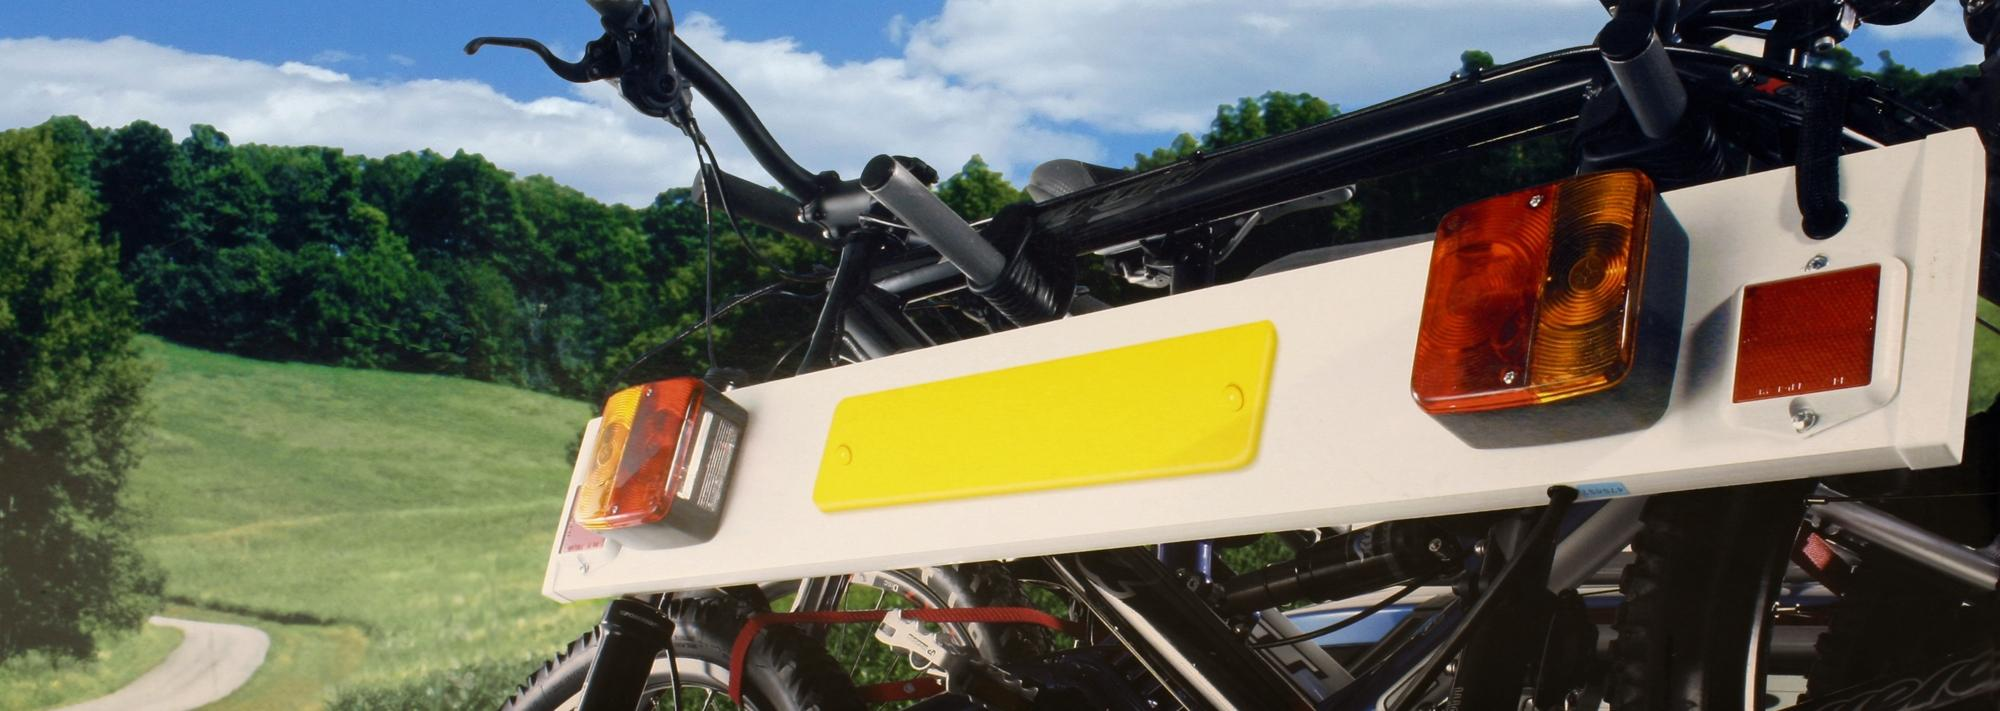 halfords cycle carrier lighting board rear number plate lights rh ebay co uk halfords cycle carrier lighting board wiring kit